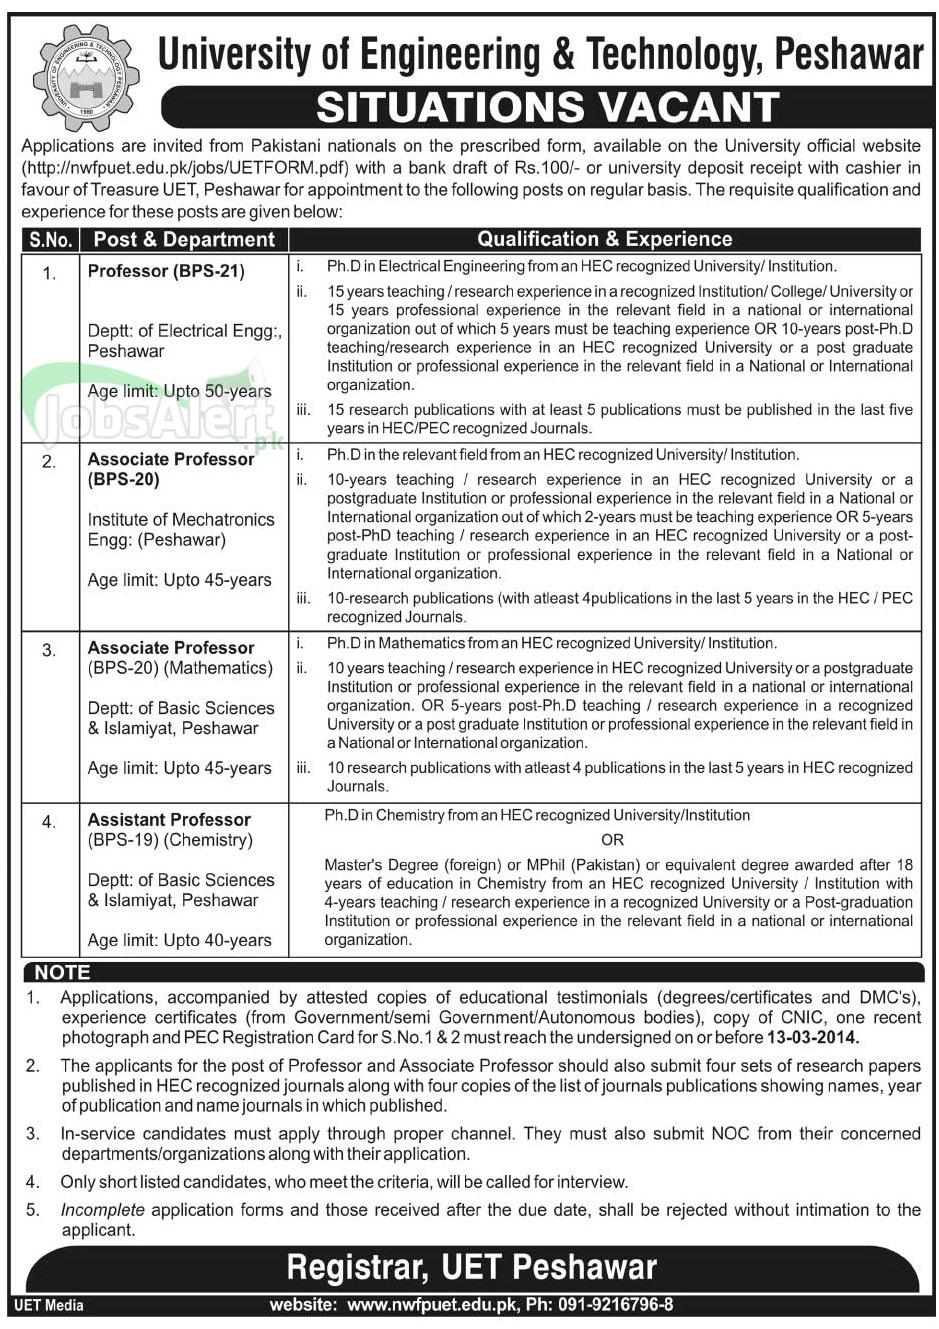 Govt Jobs in University of Engineering & Technology Peshawar